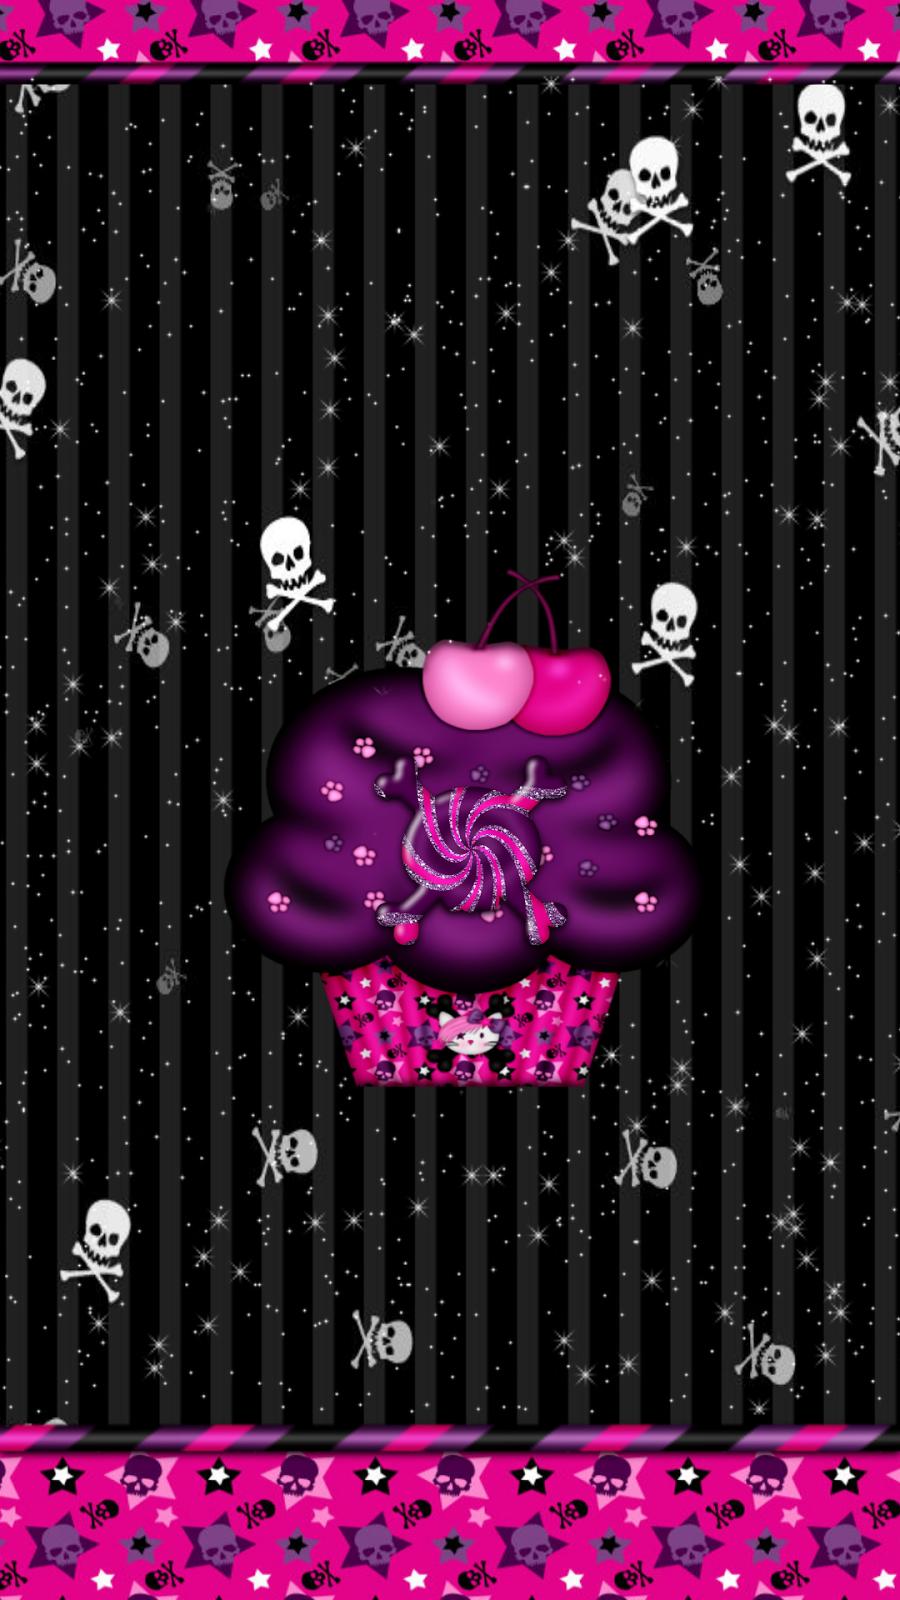 Blingin-Android-Hallo-Kitty-Walls-wallpaper-wp520188